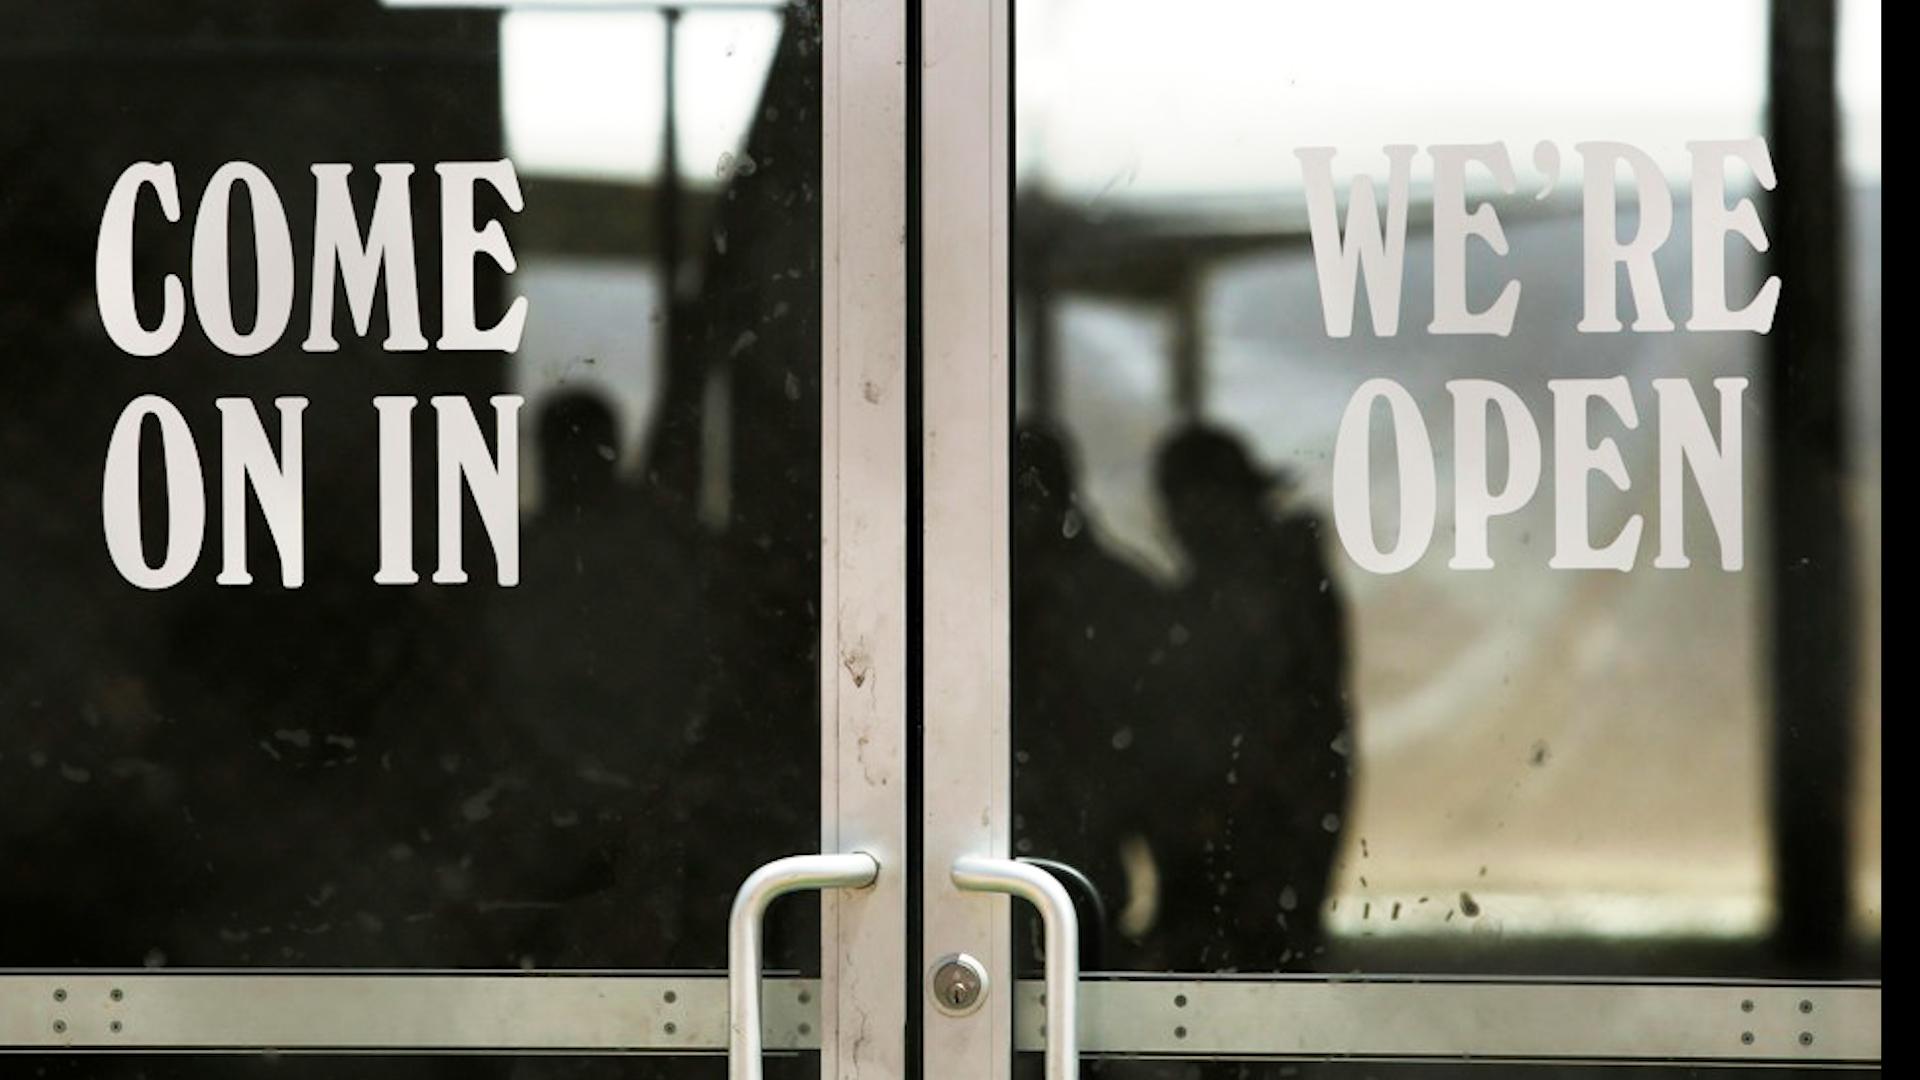 Senator intervenes at border to help Mexican family apply for asylum